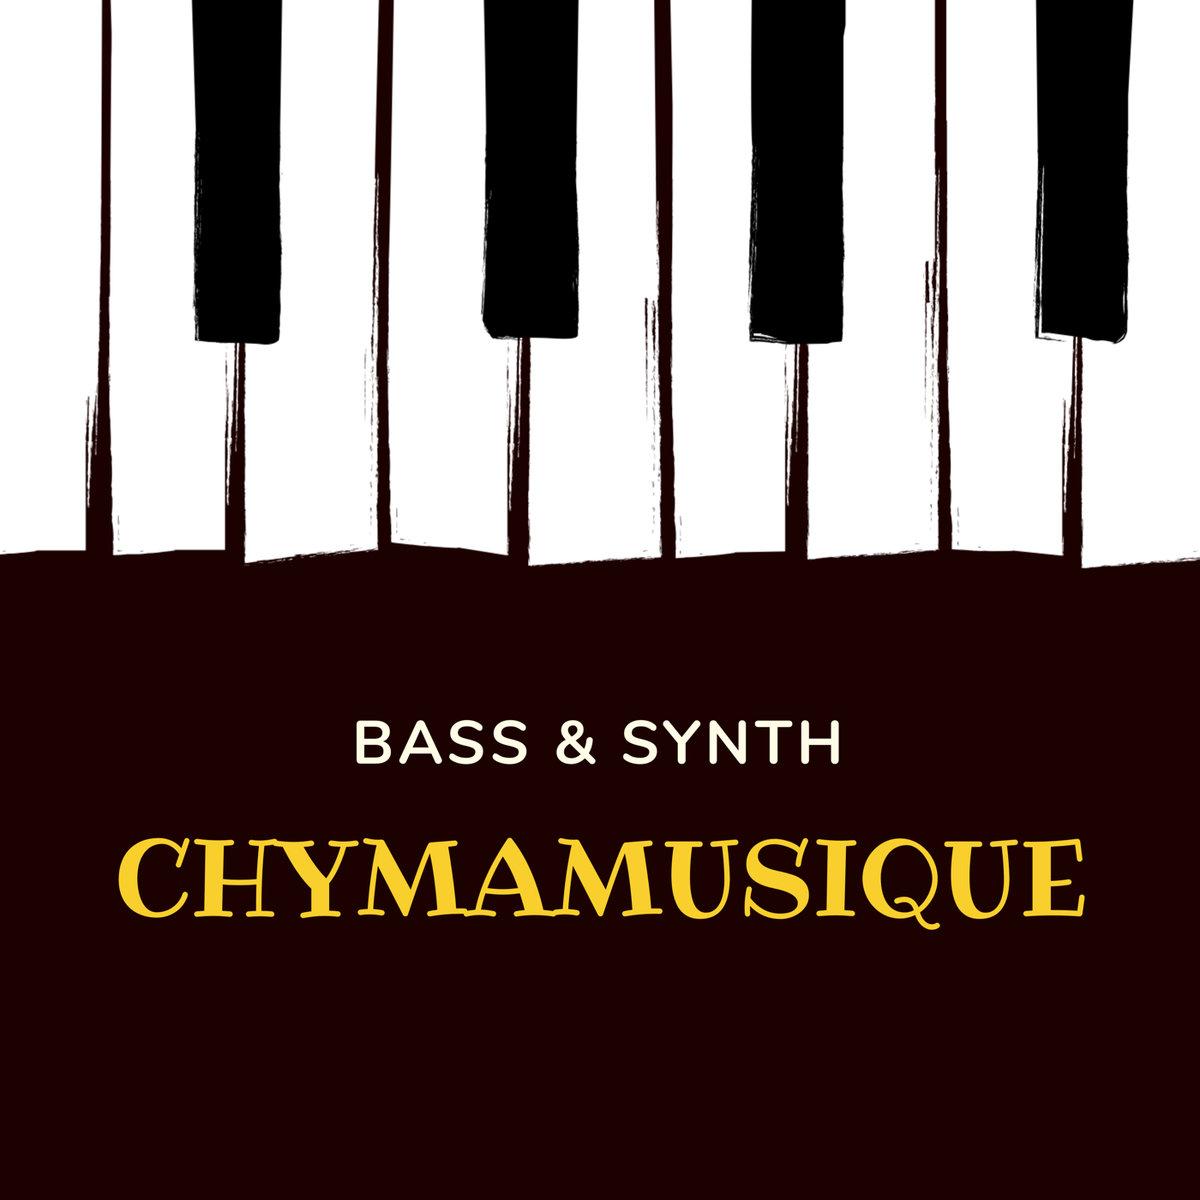 Chymamusique Bass Synth - Chymamusique – Bass & Synth